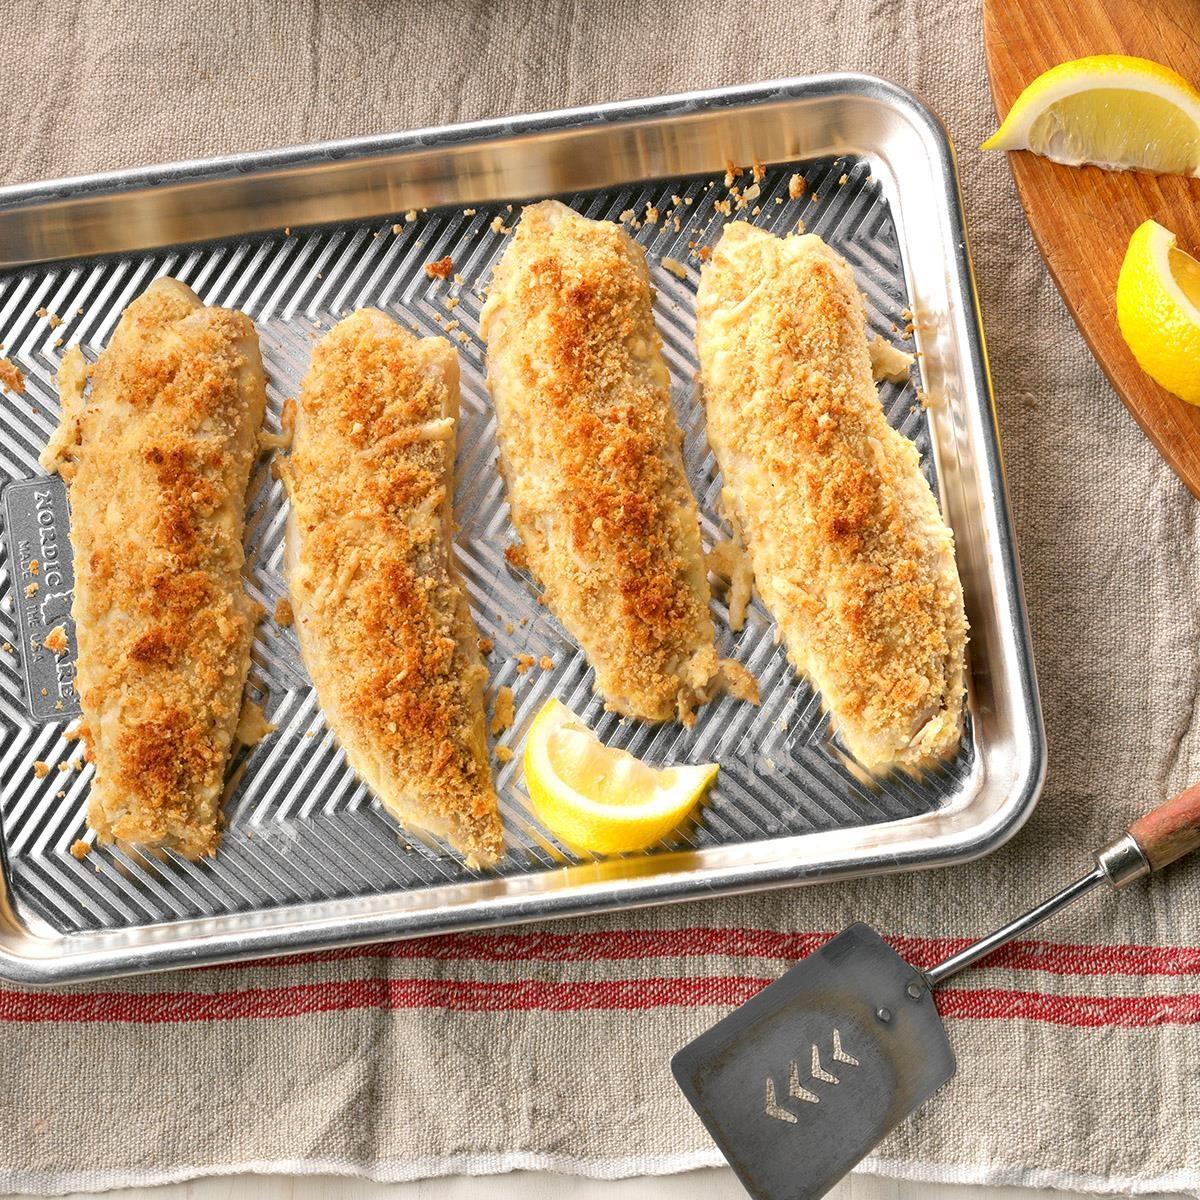 Day 8: Dijon-Crusted Fish